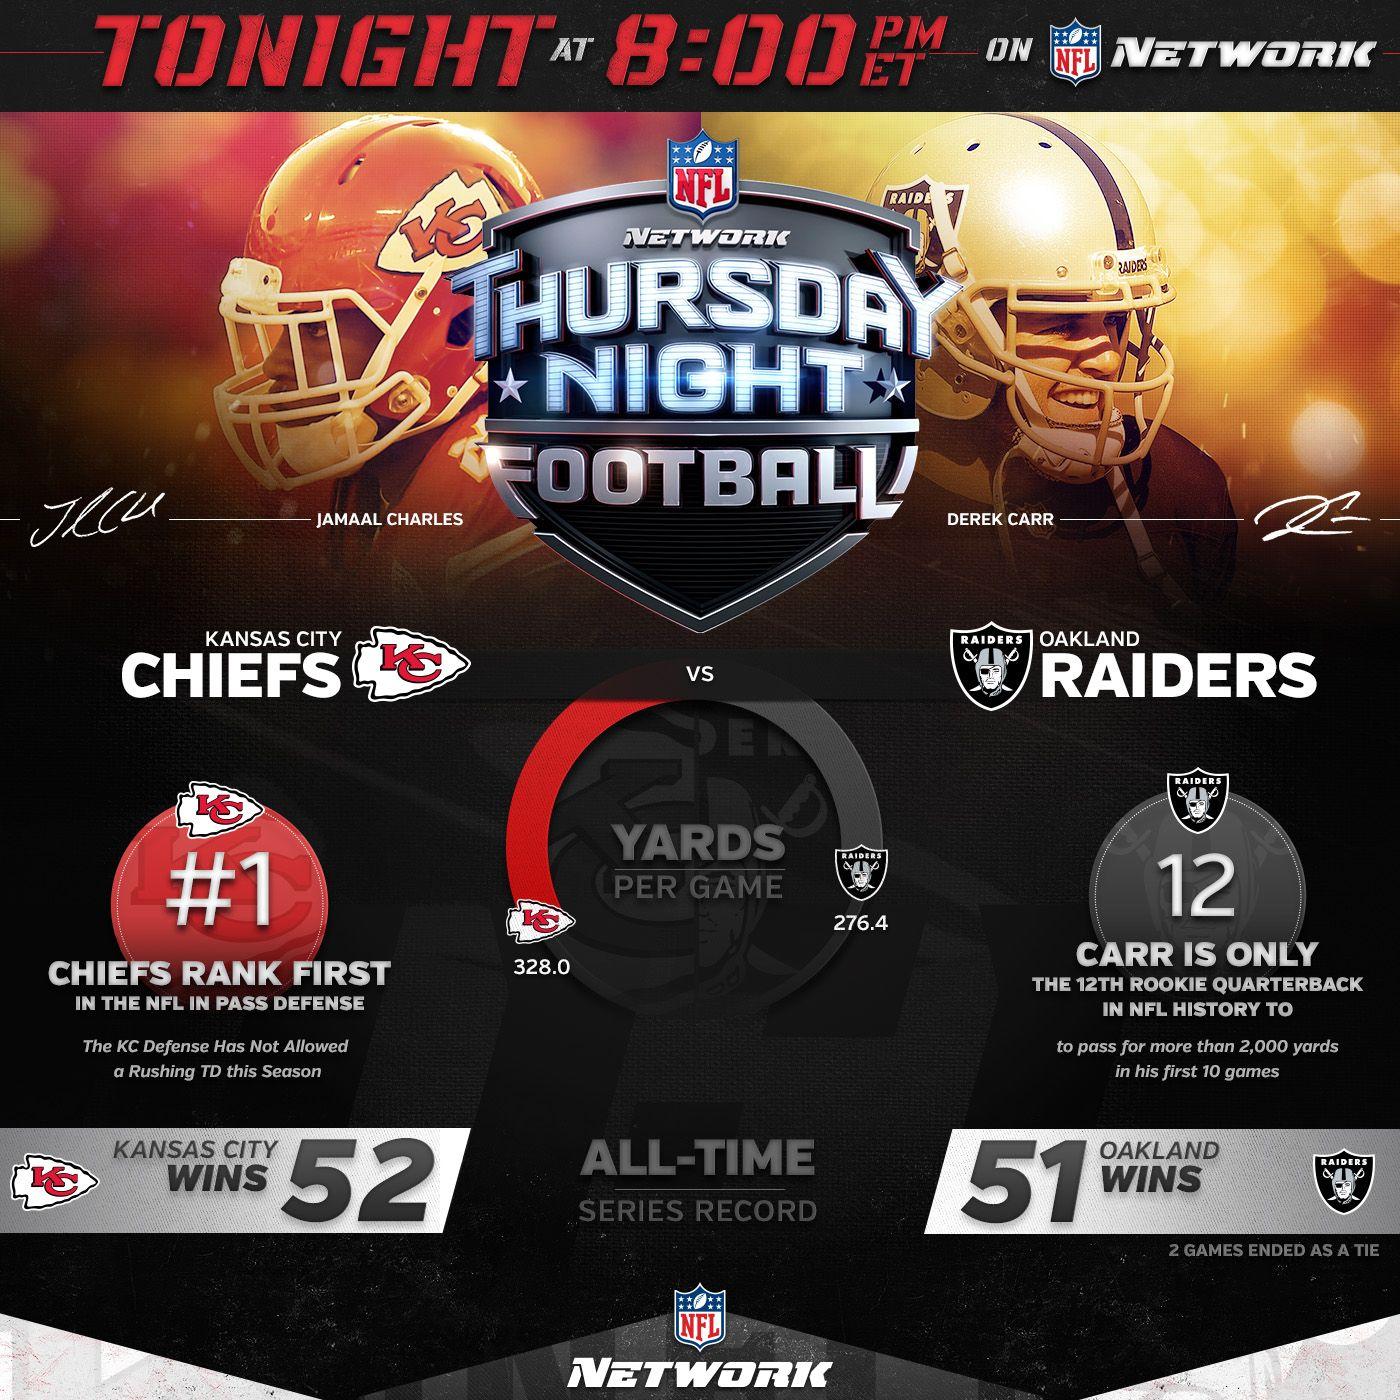 Pregame Infographic For Kansas City Chiefs Vs Oakland Raiders On Nfl Network S Thursday Nig Nfl Network Social Media Marketing Agency Social Media Marketing